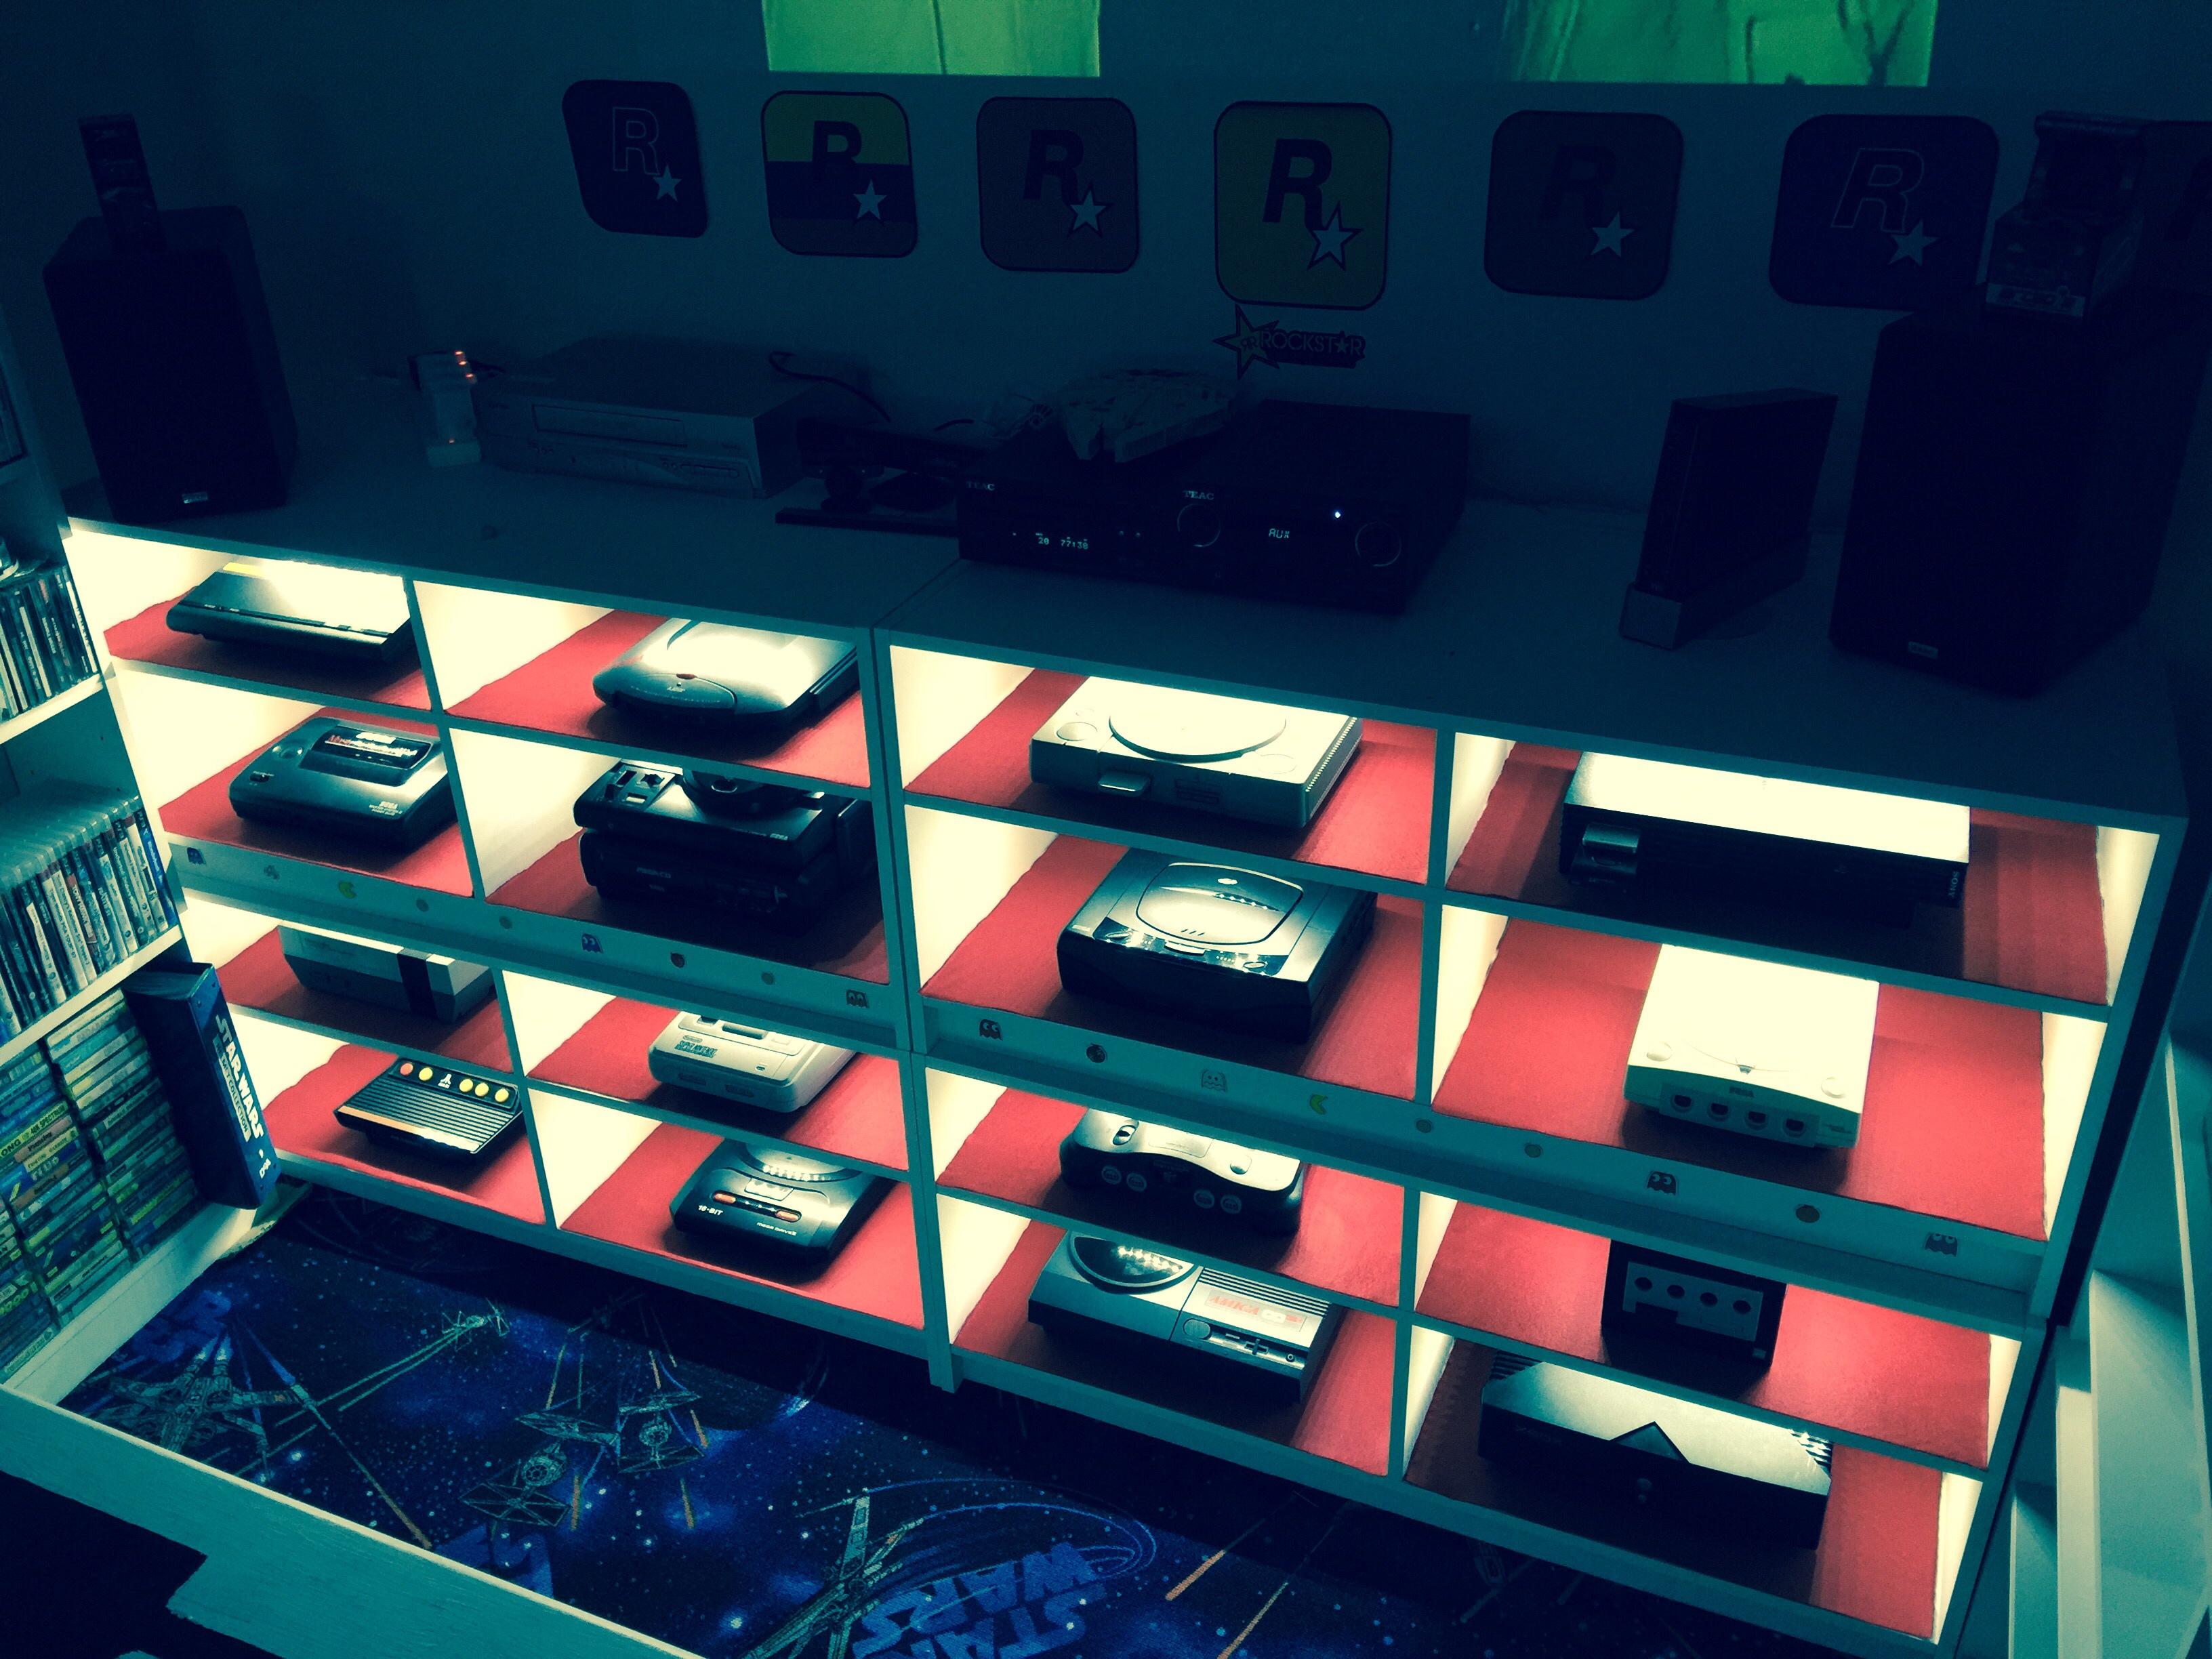 Wallpaper : PSP, starwars, Nintendo, Amiga, Atari, retro